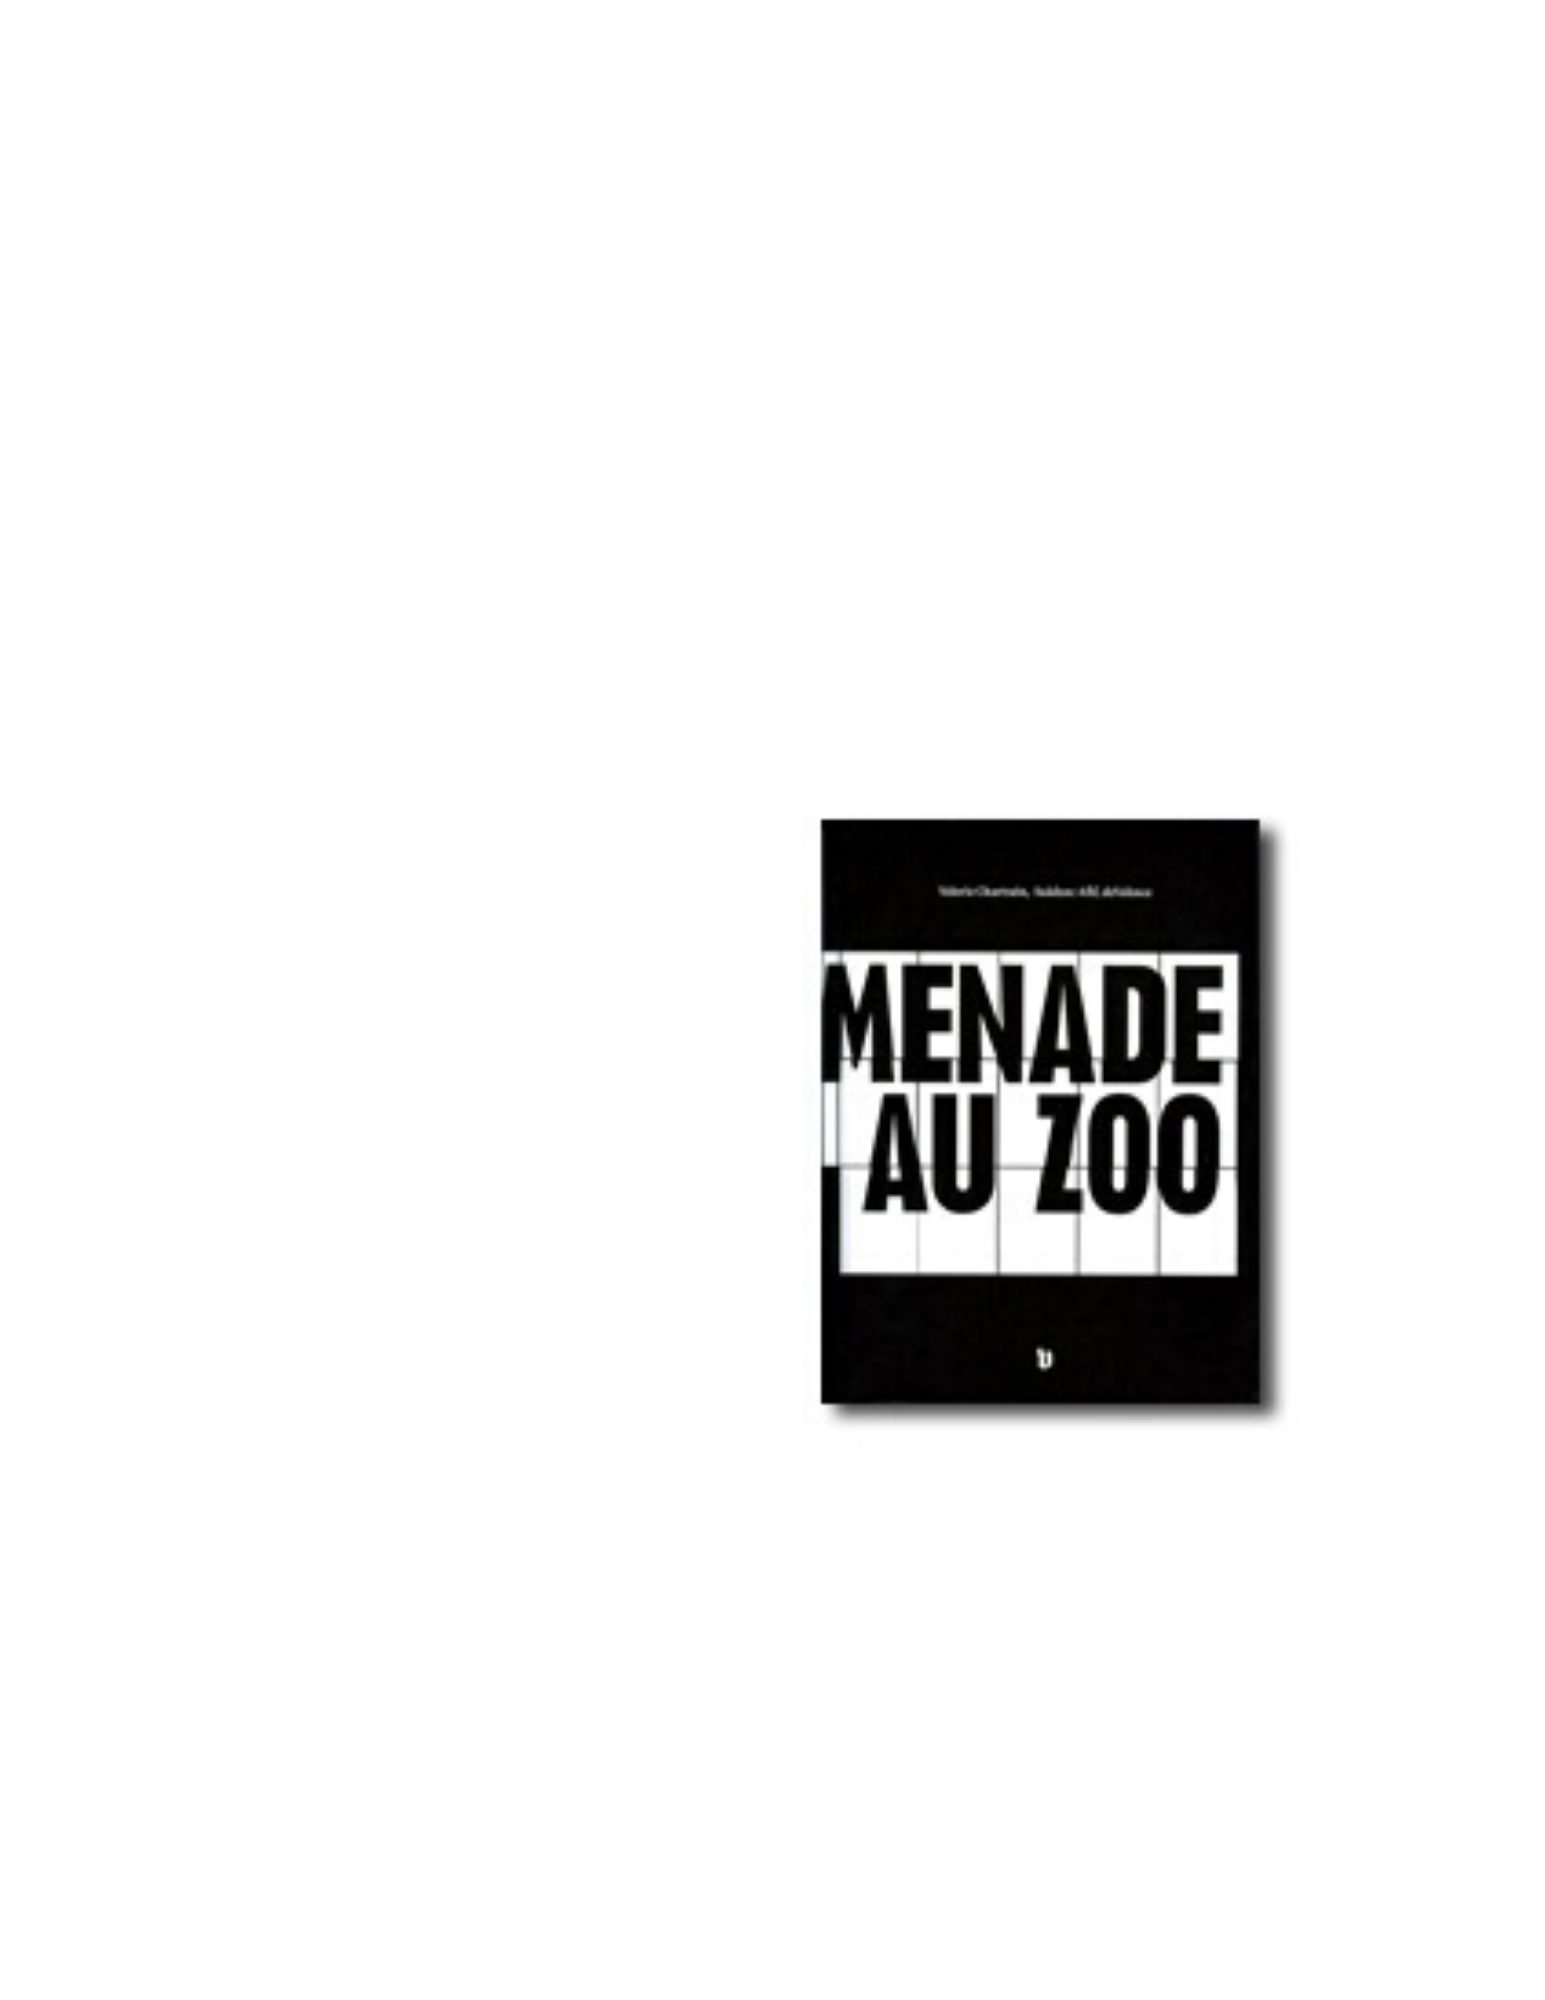 Publications/ Promenade au zoo